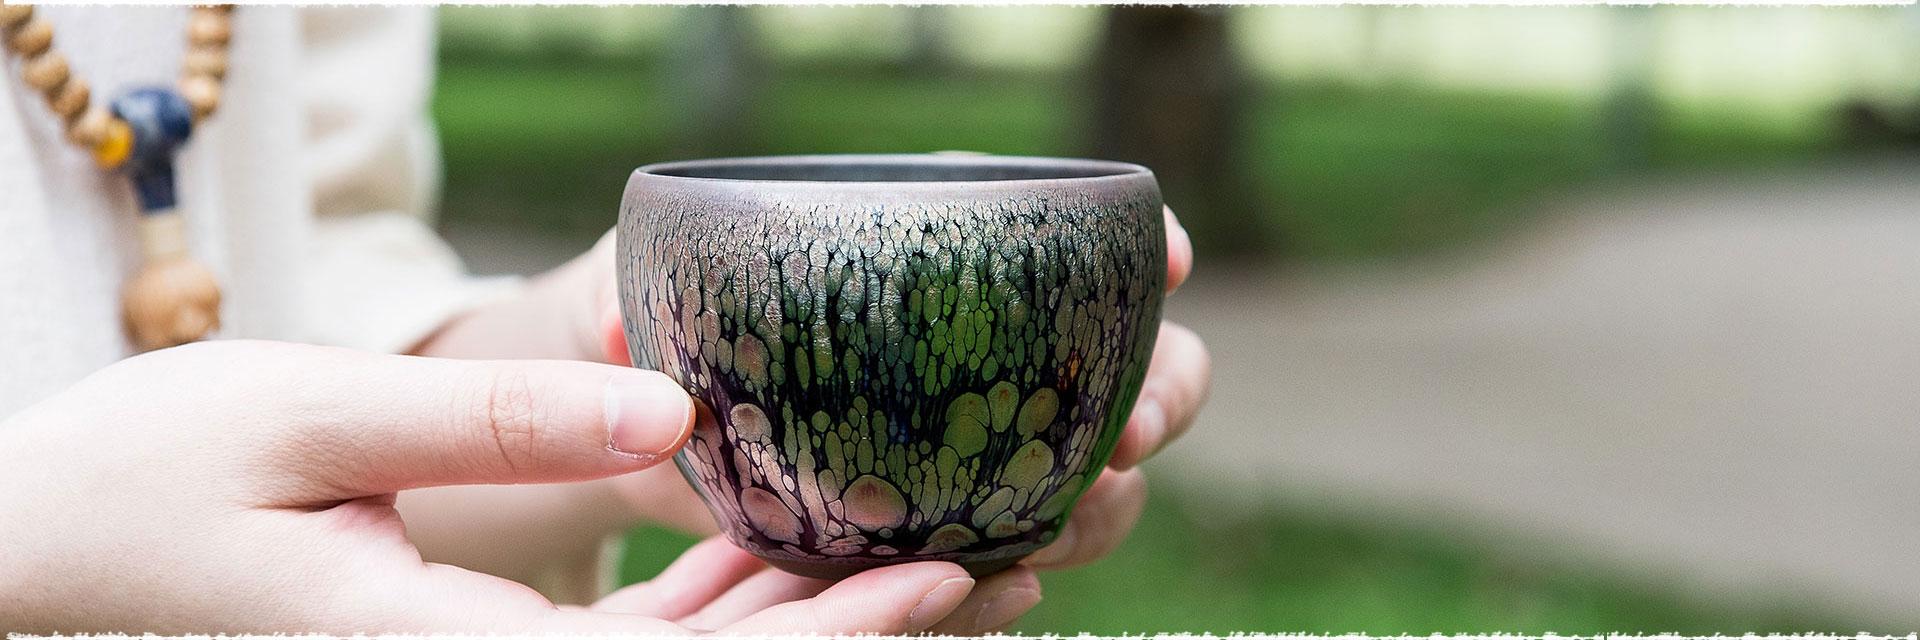 Yao Bian (furnace transmutation) in Teaware